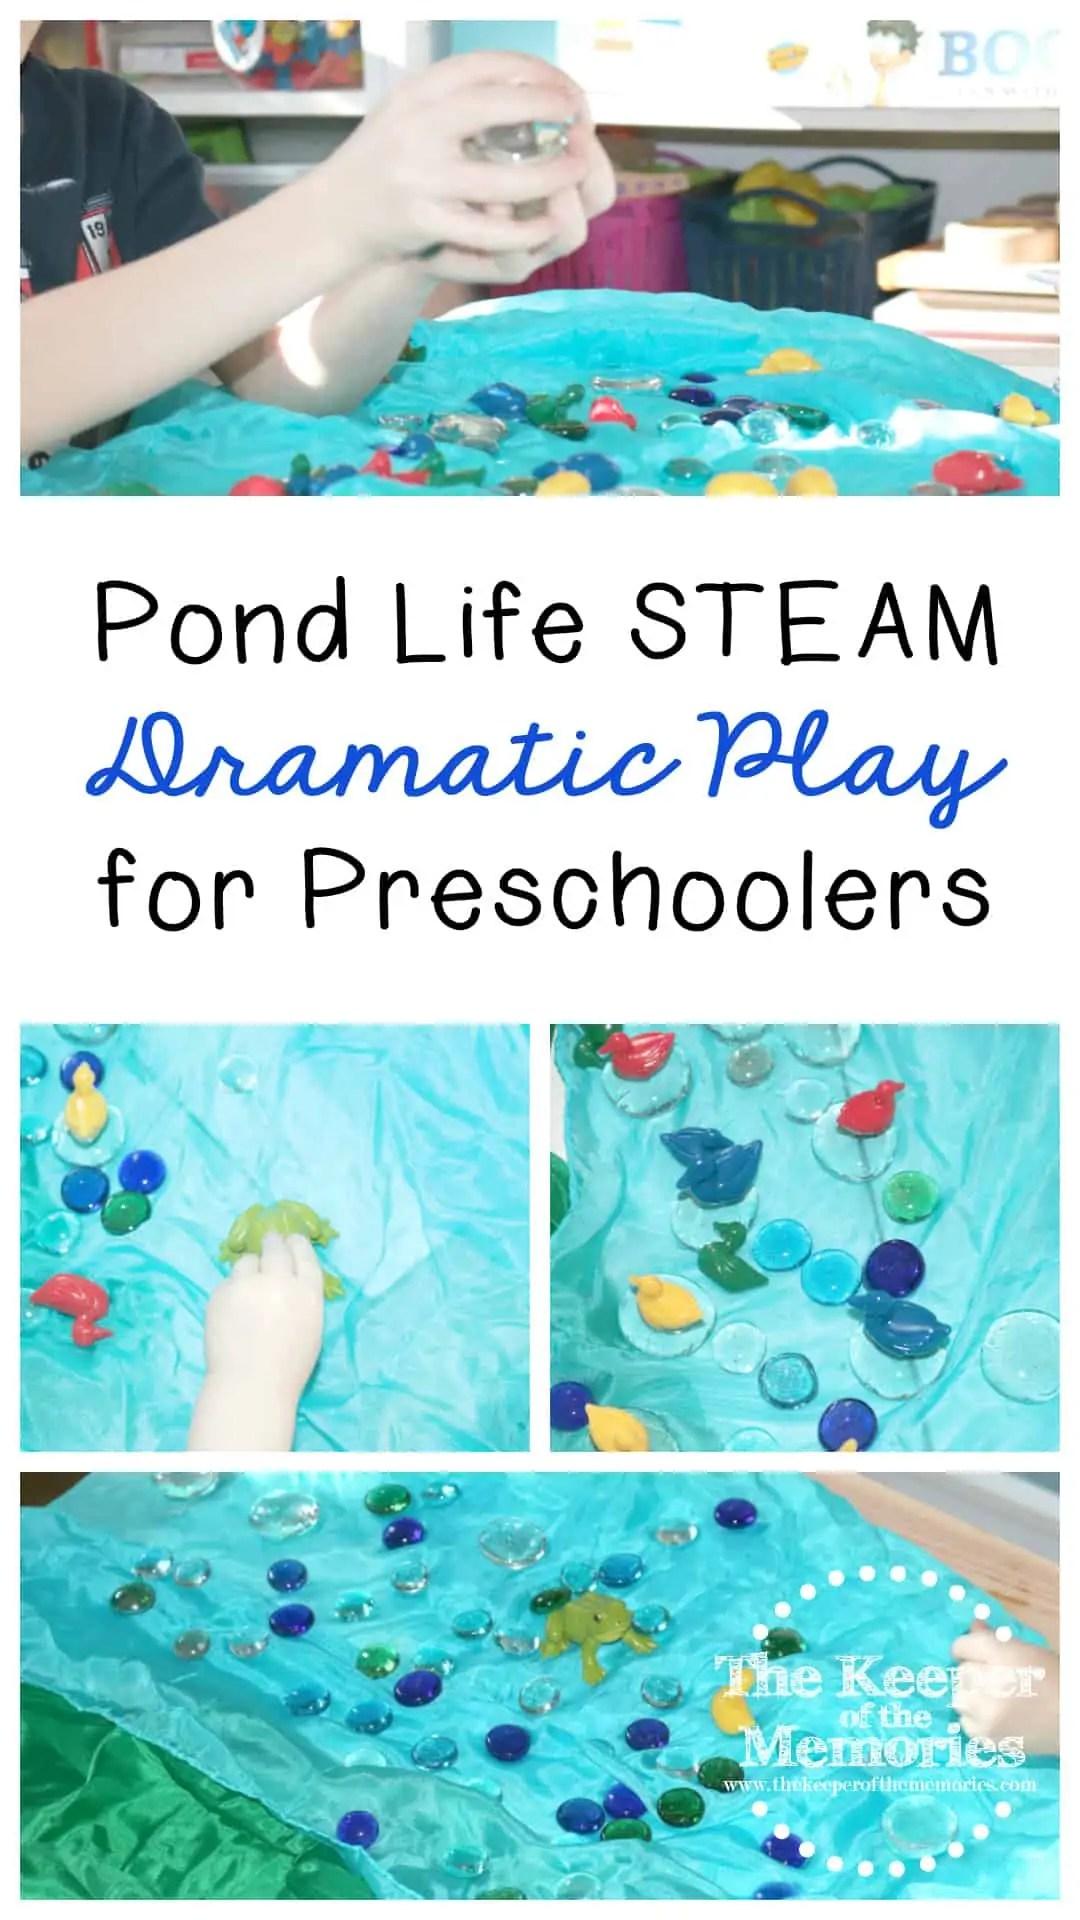 Pond Life Steam